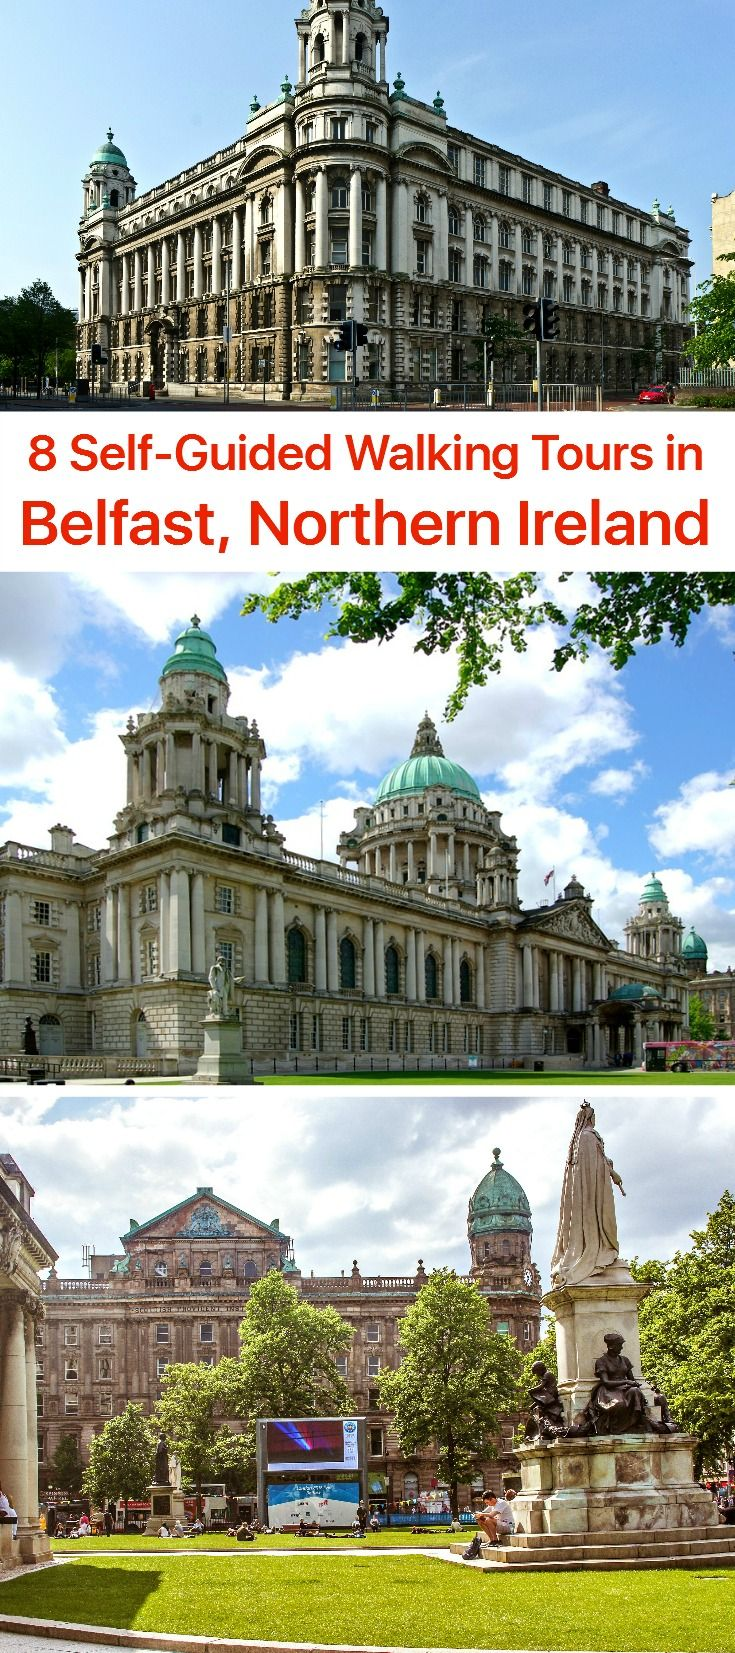 The capital of Northern Ireland Belfast is